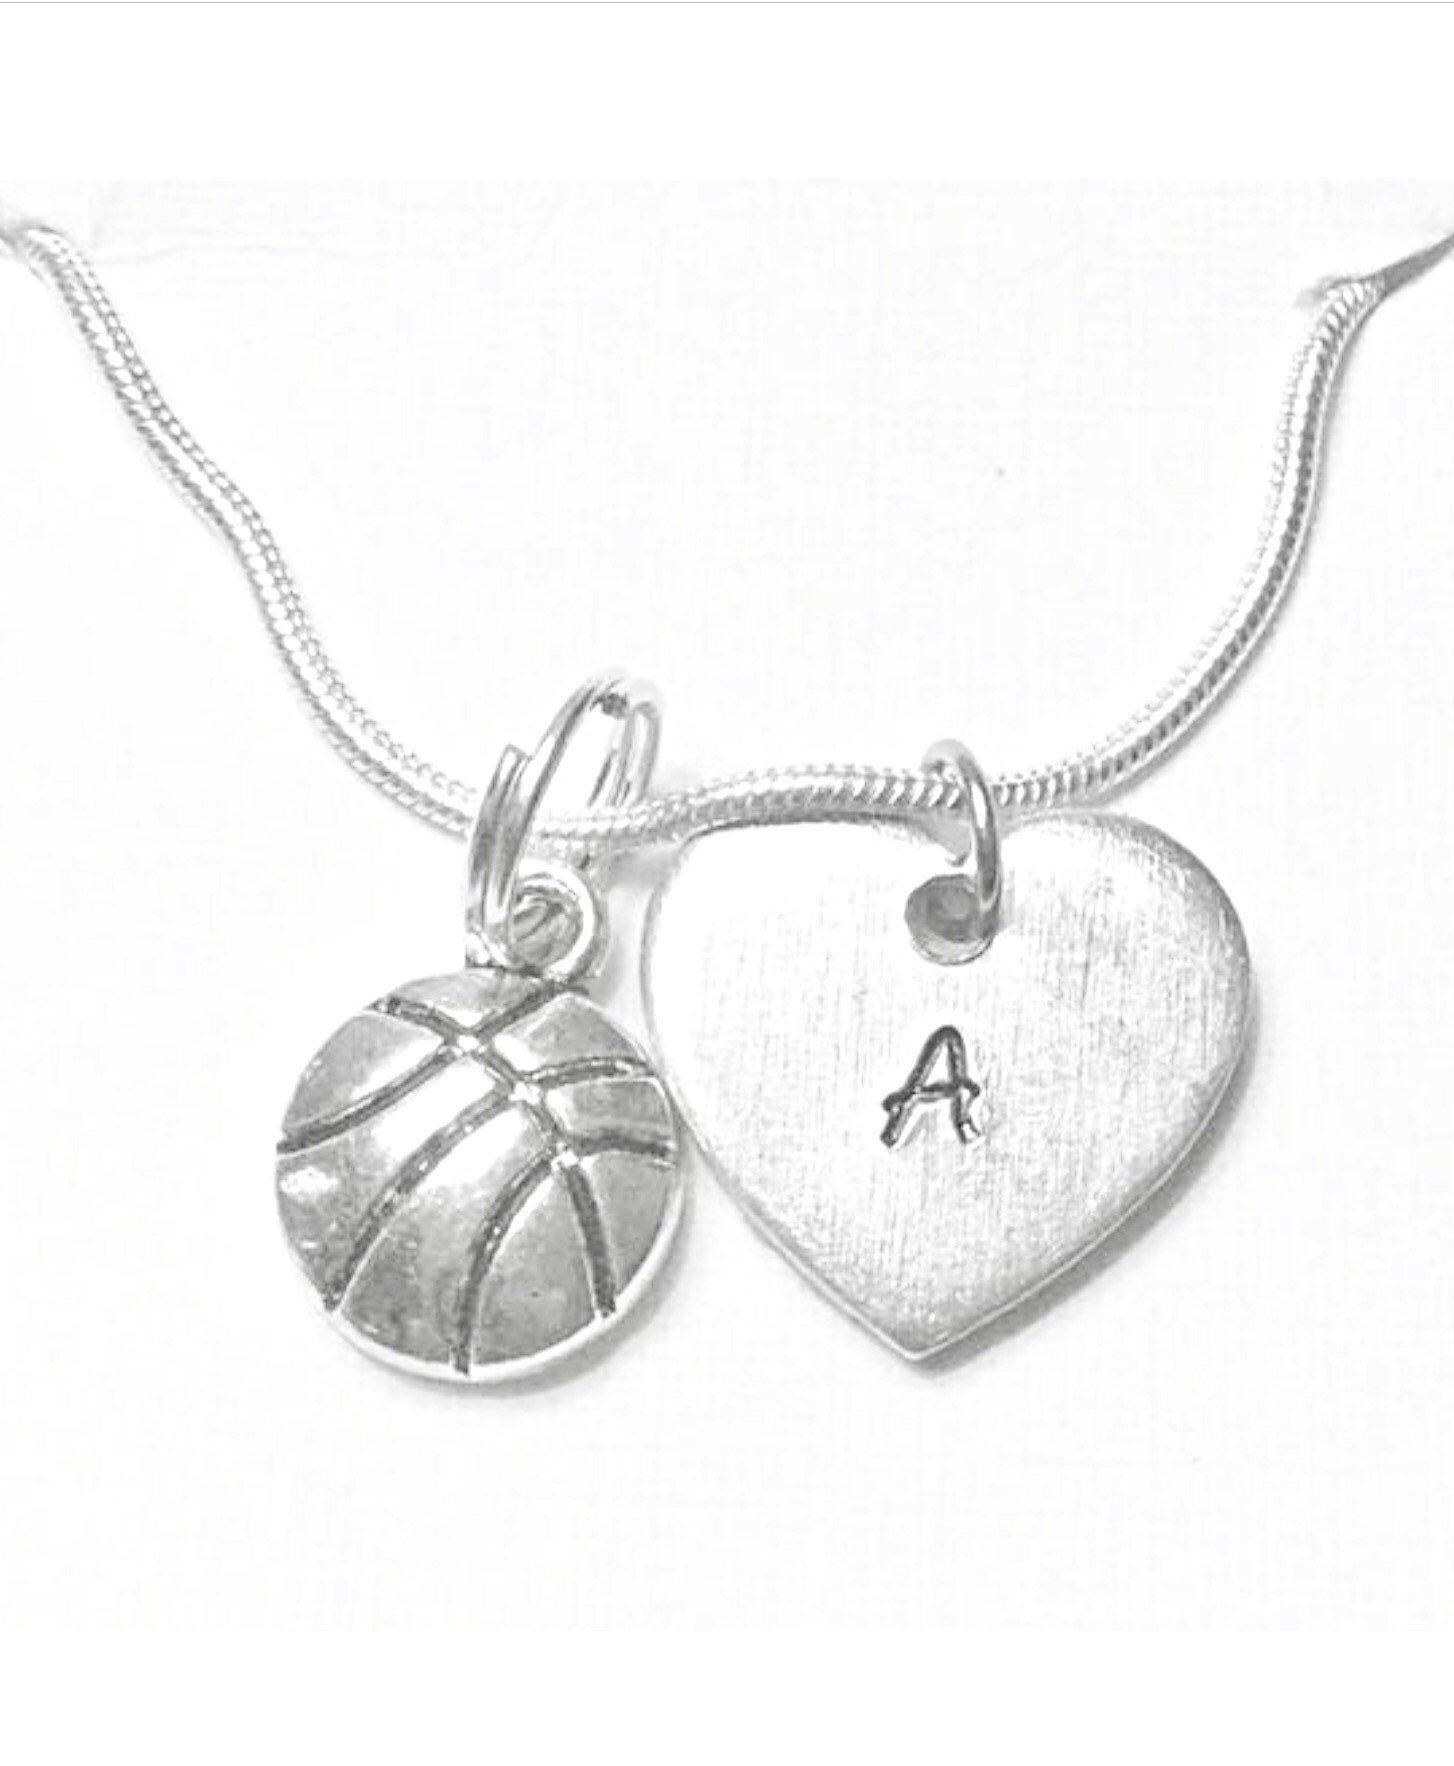 Basketball necklace basketball gift basketball lover